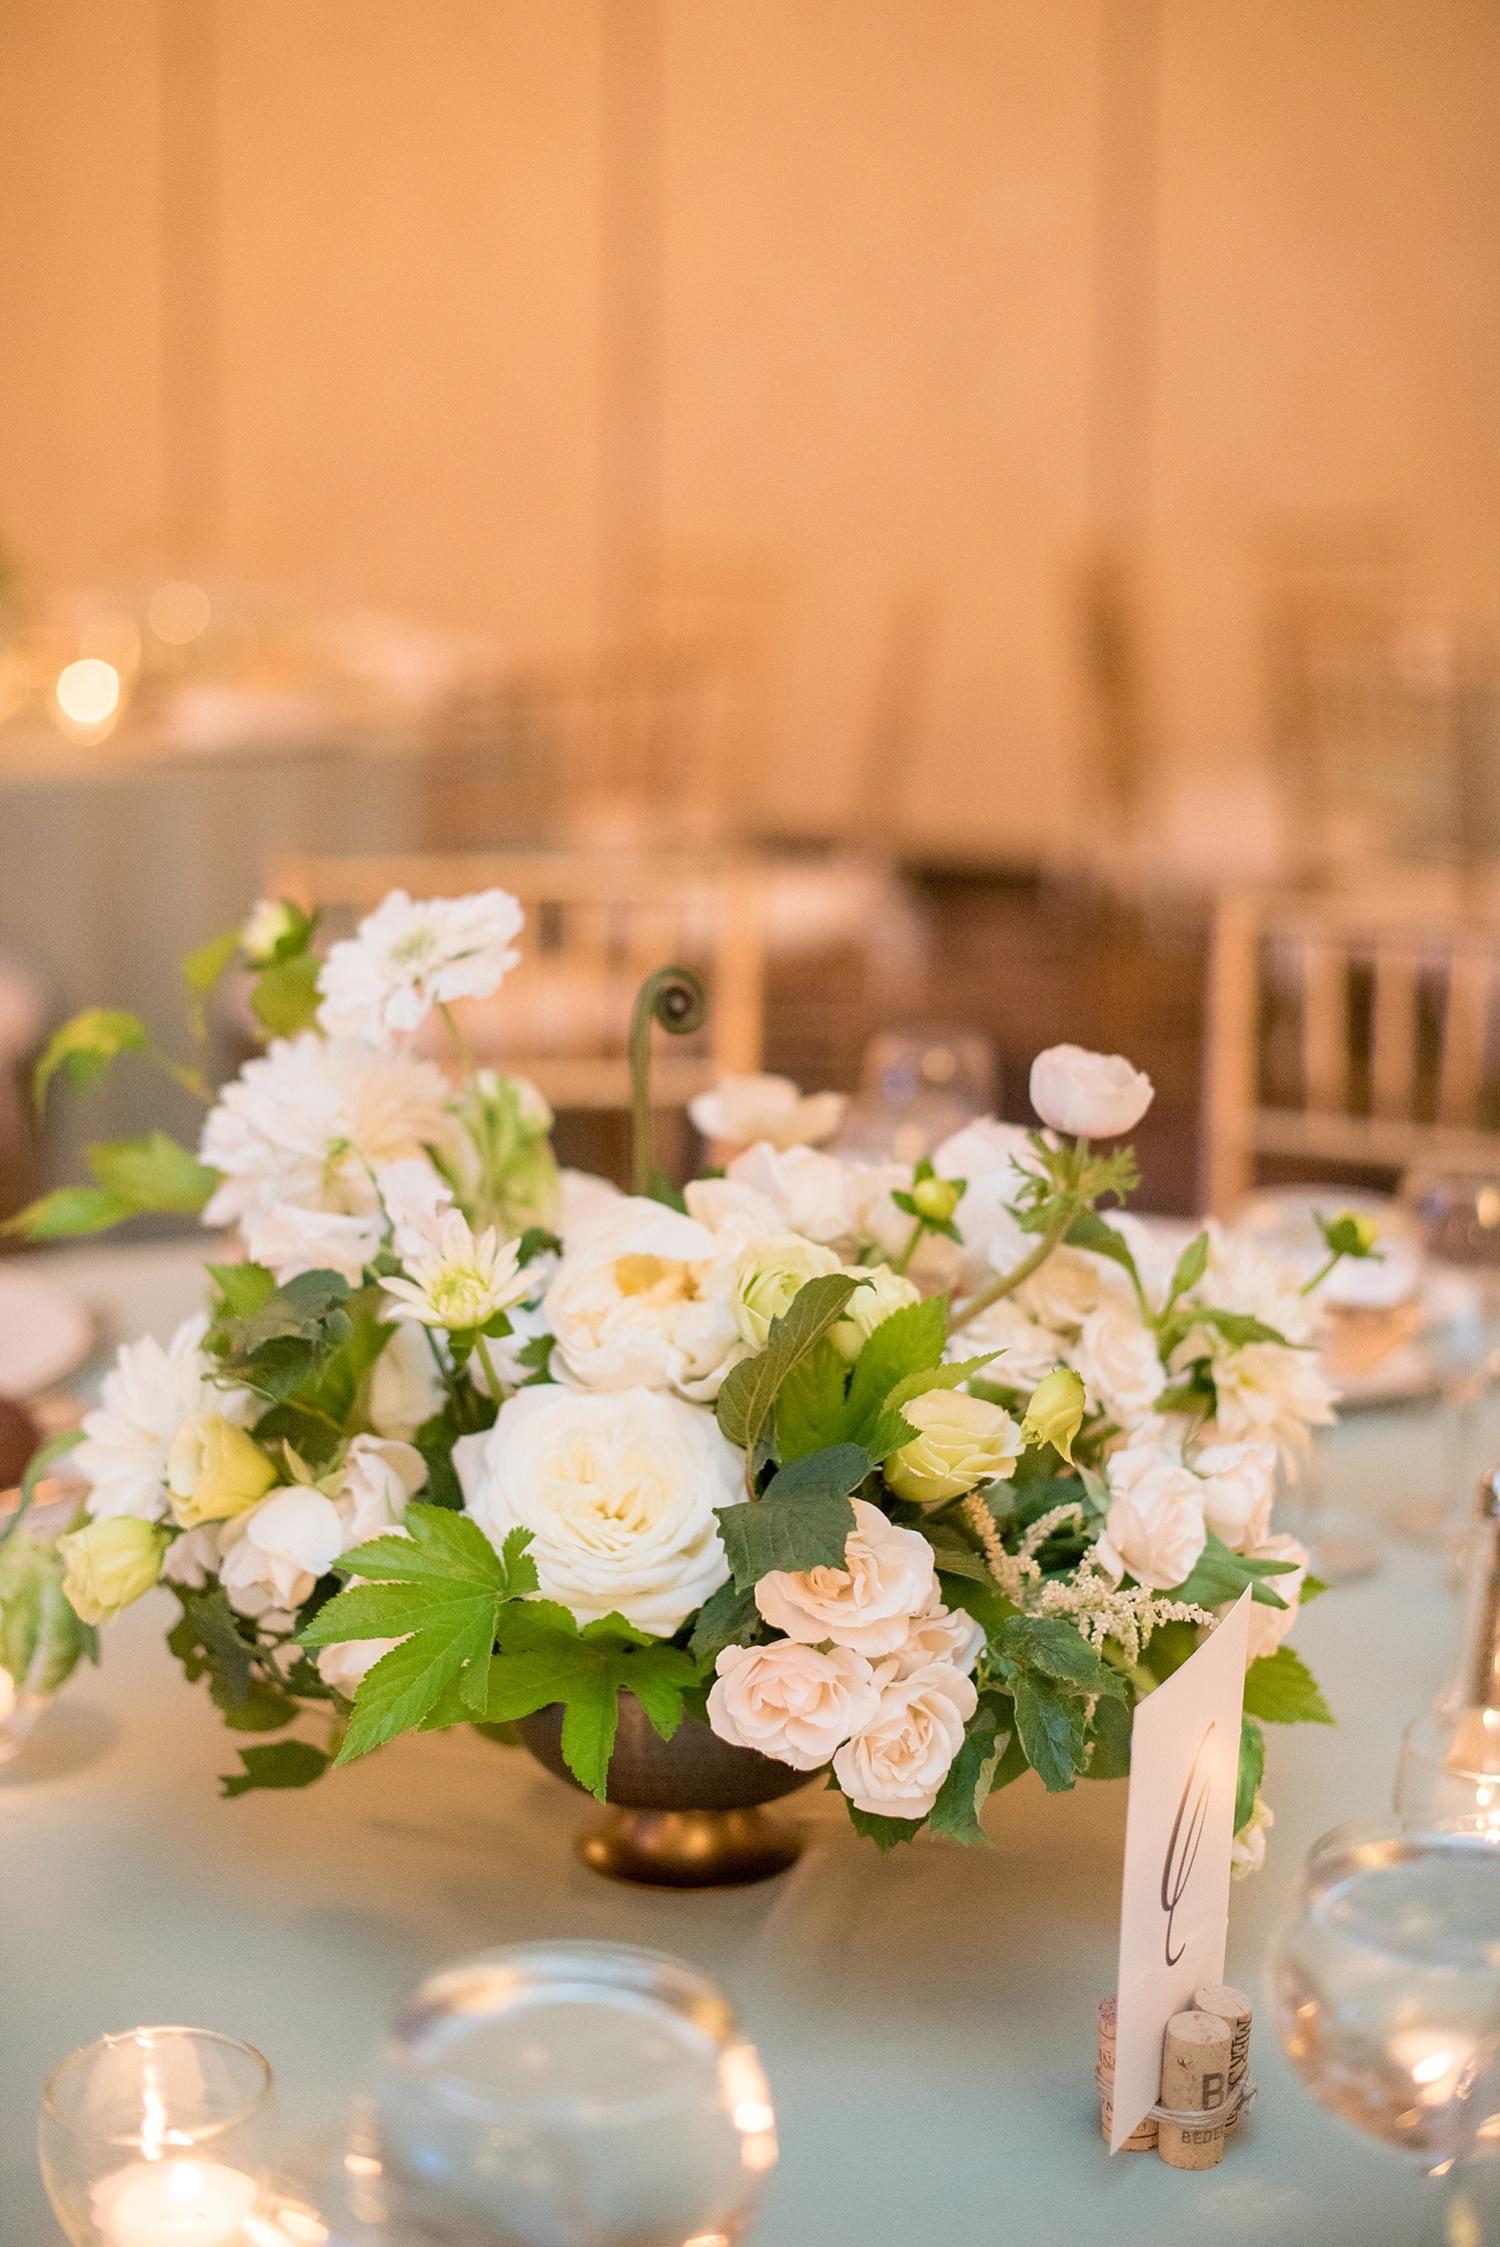 mikkelpaige-full_aperture_floral-pearl_river_hilton_wedding_0034.jpg